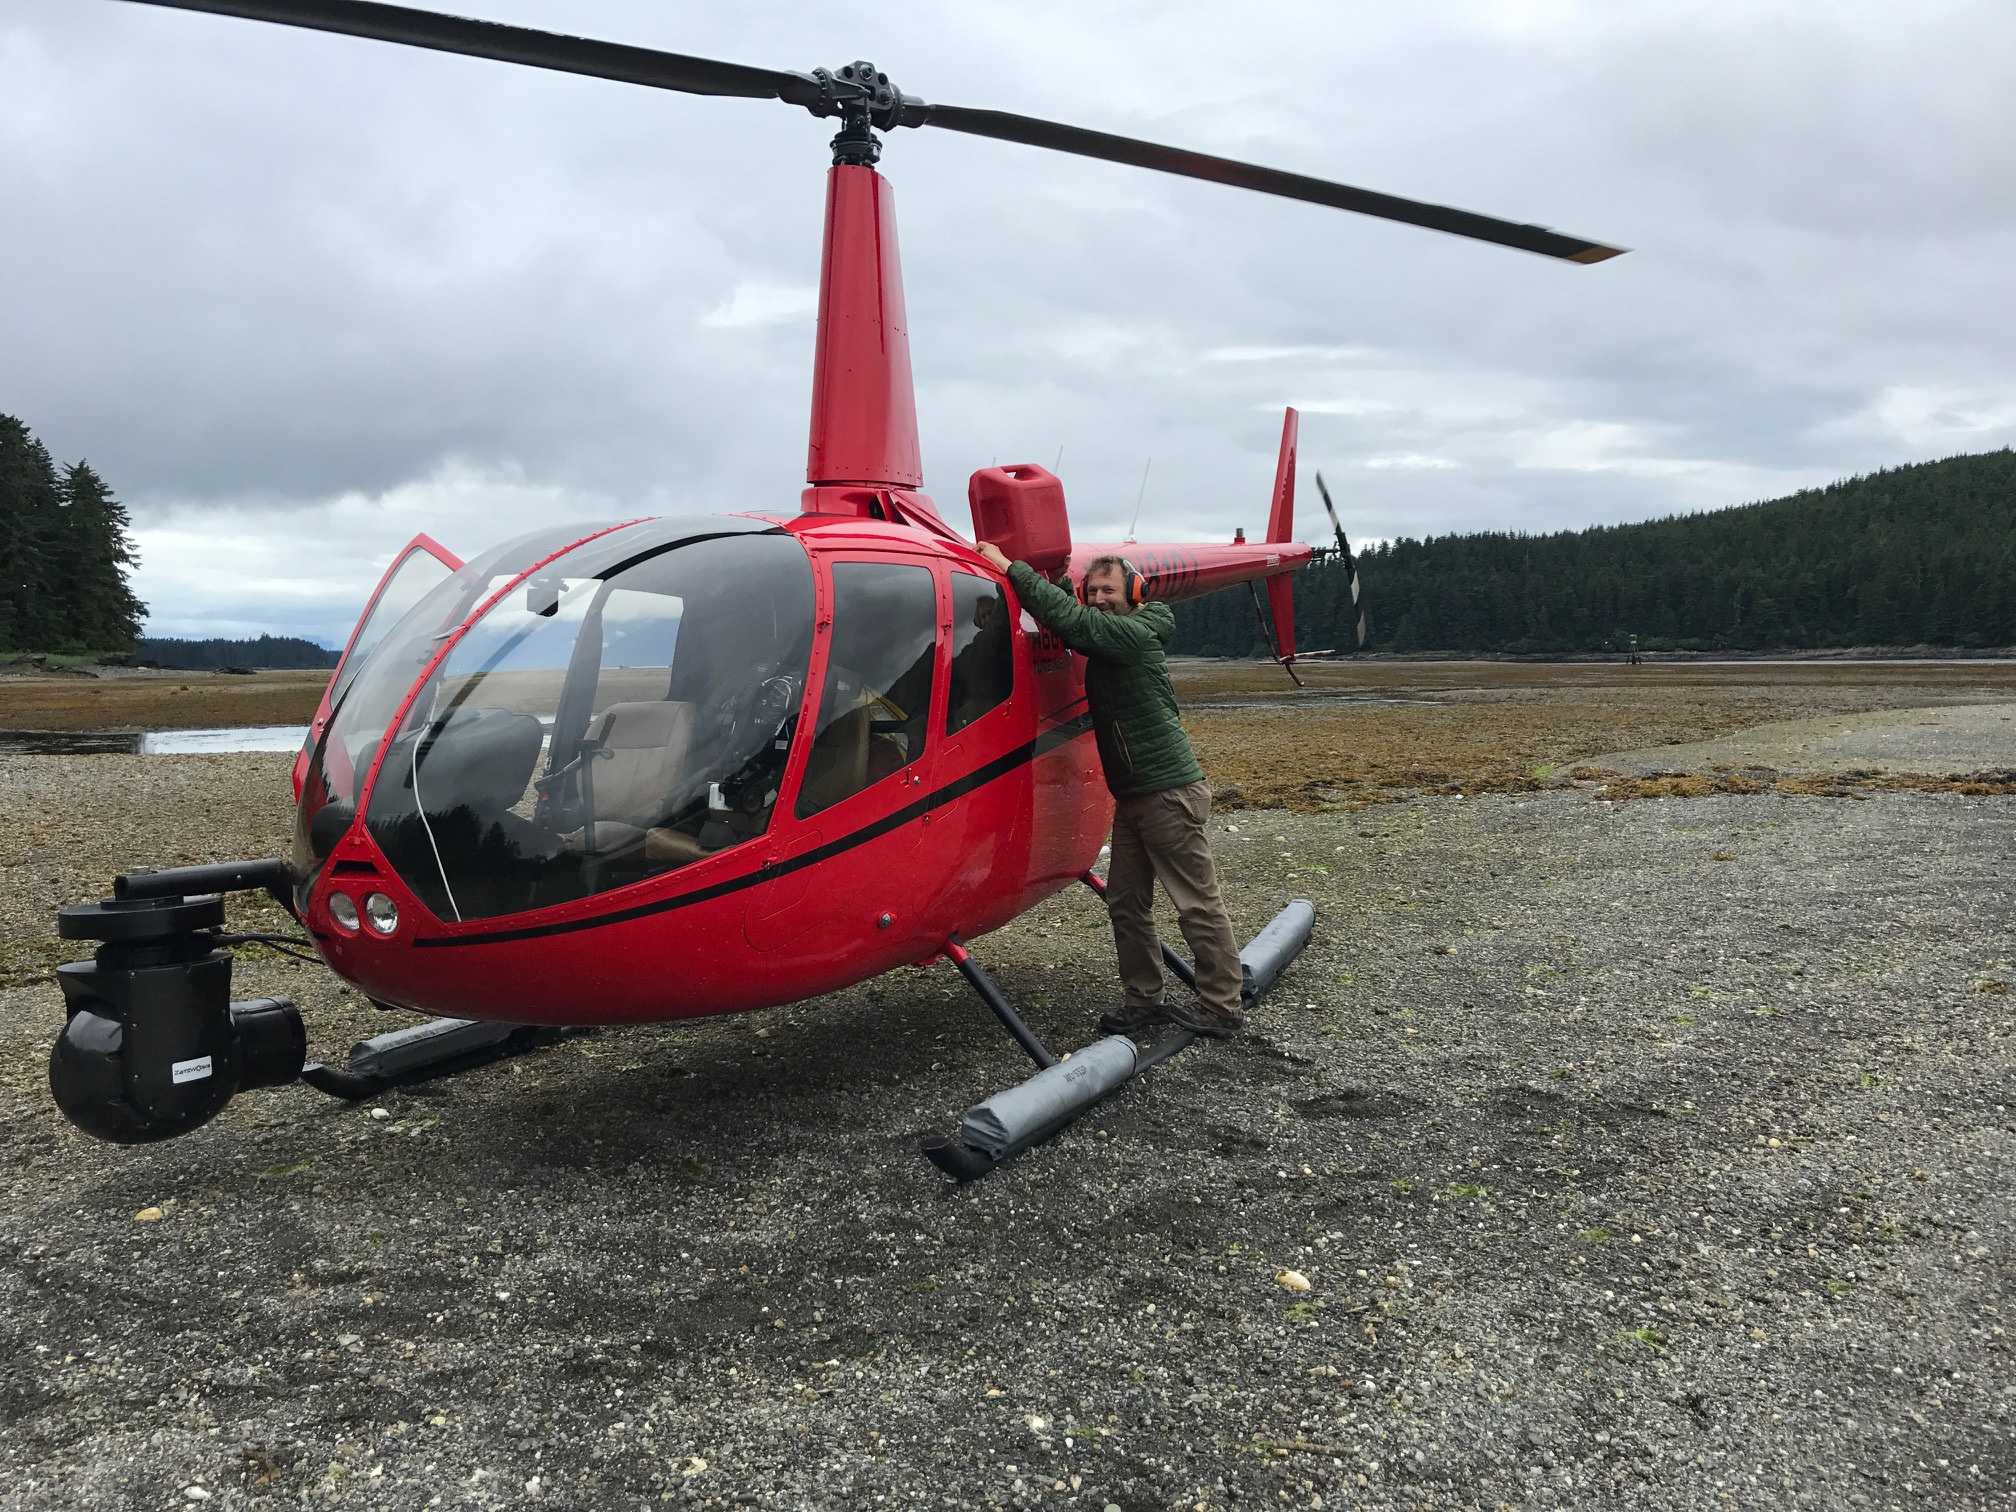 Daniel Zatz with R66 helicopter for aerial footage capture in alaska - Zatzworks Aerial Video